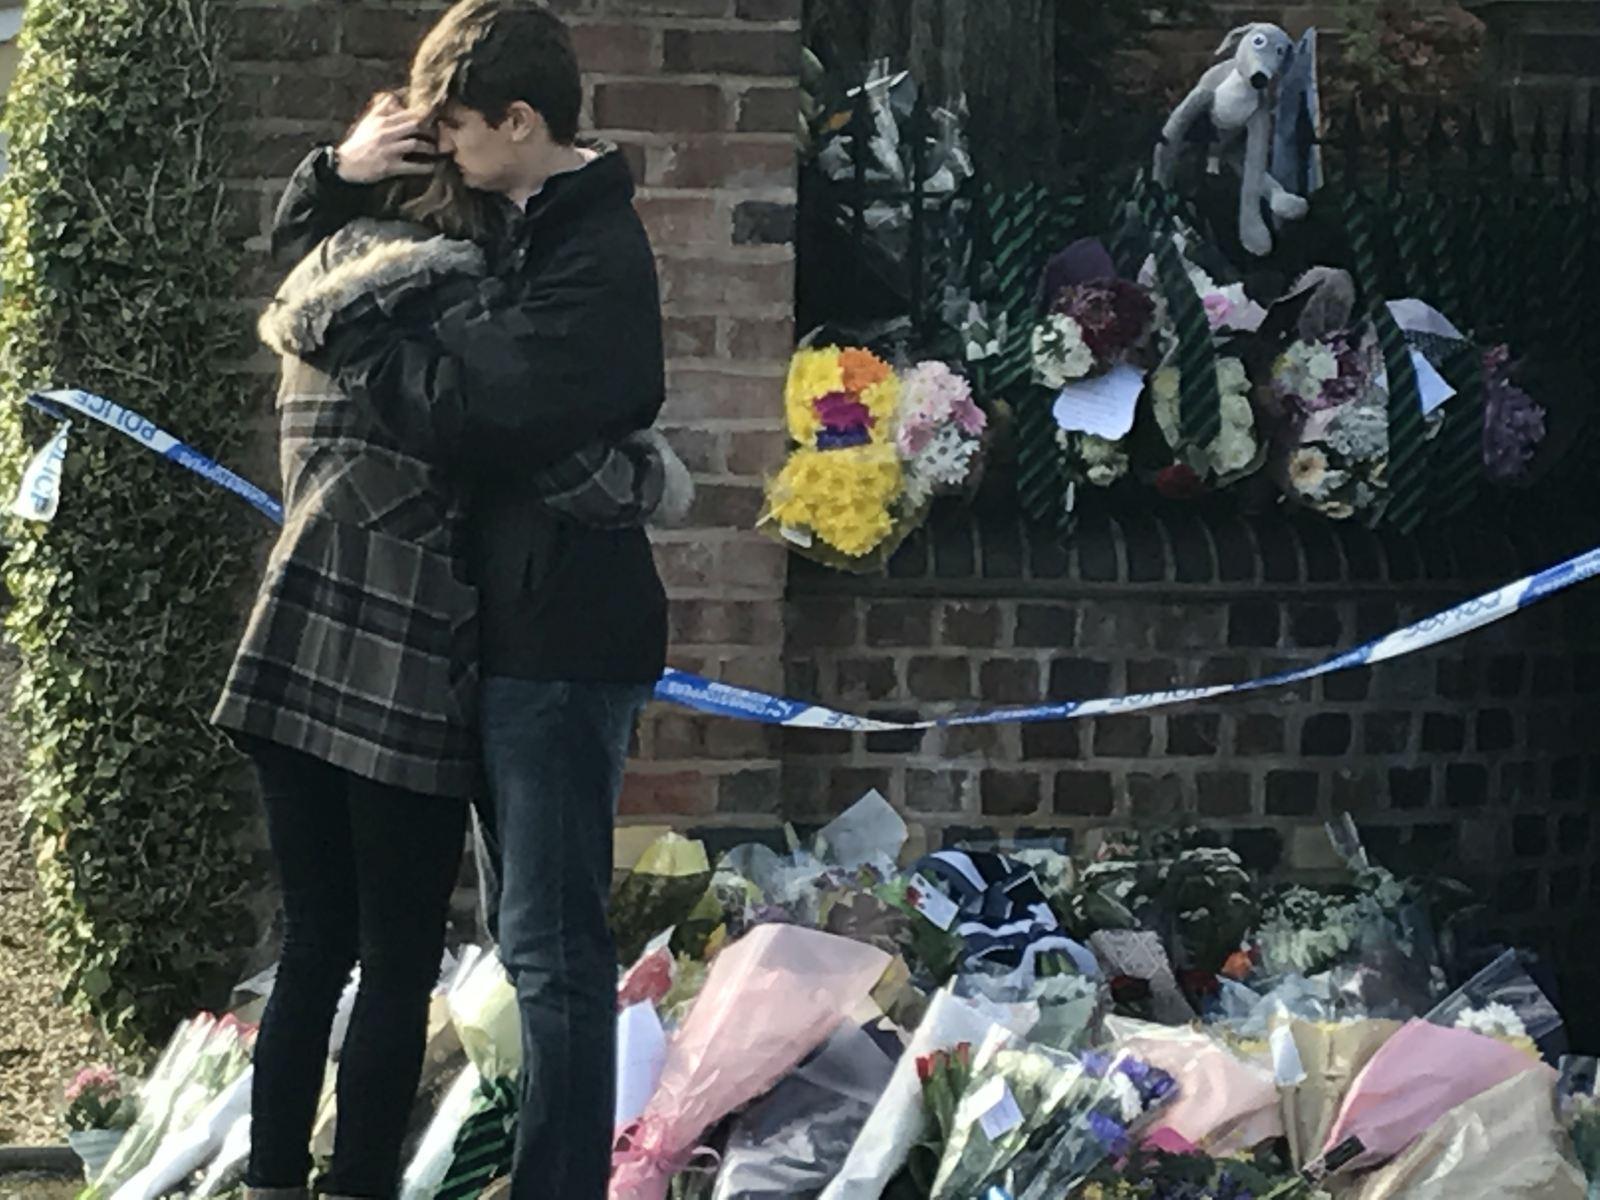 Lydia Wilkinson - Stourbridge murders